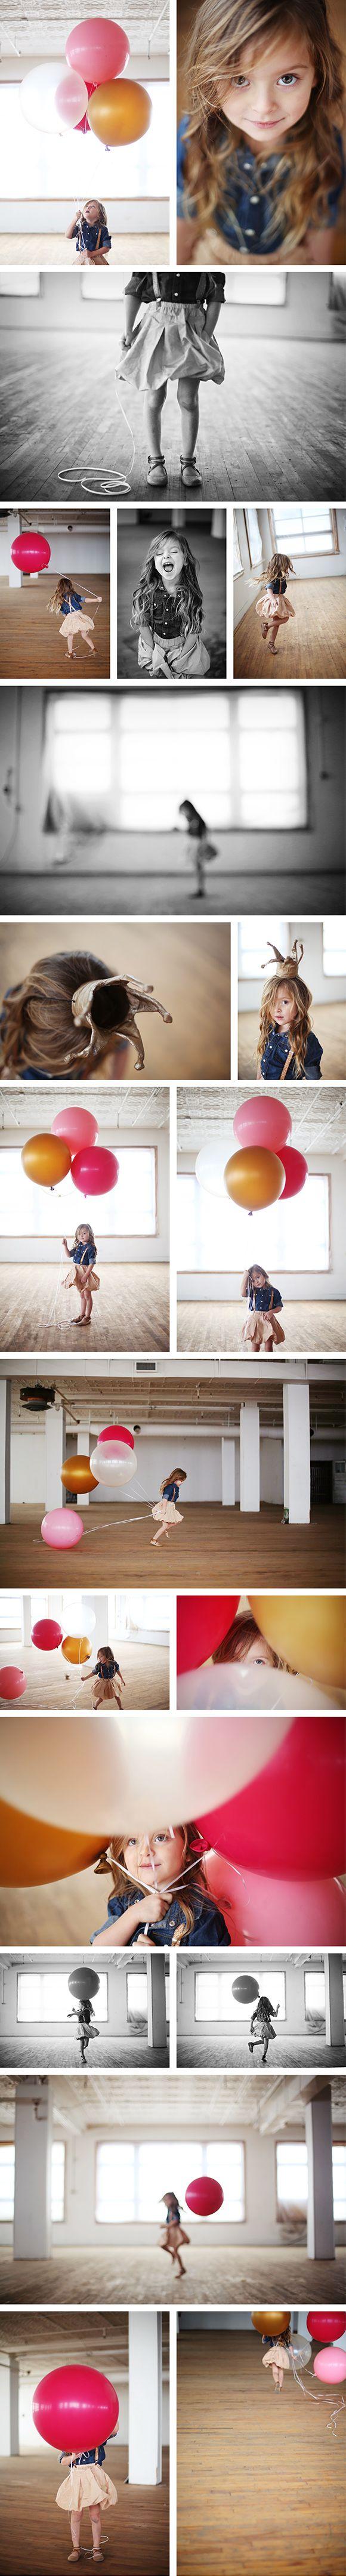 studio portrait session #photogpinspiration